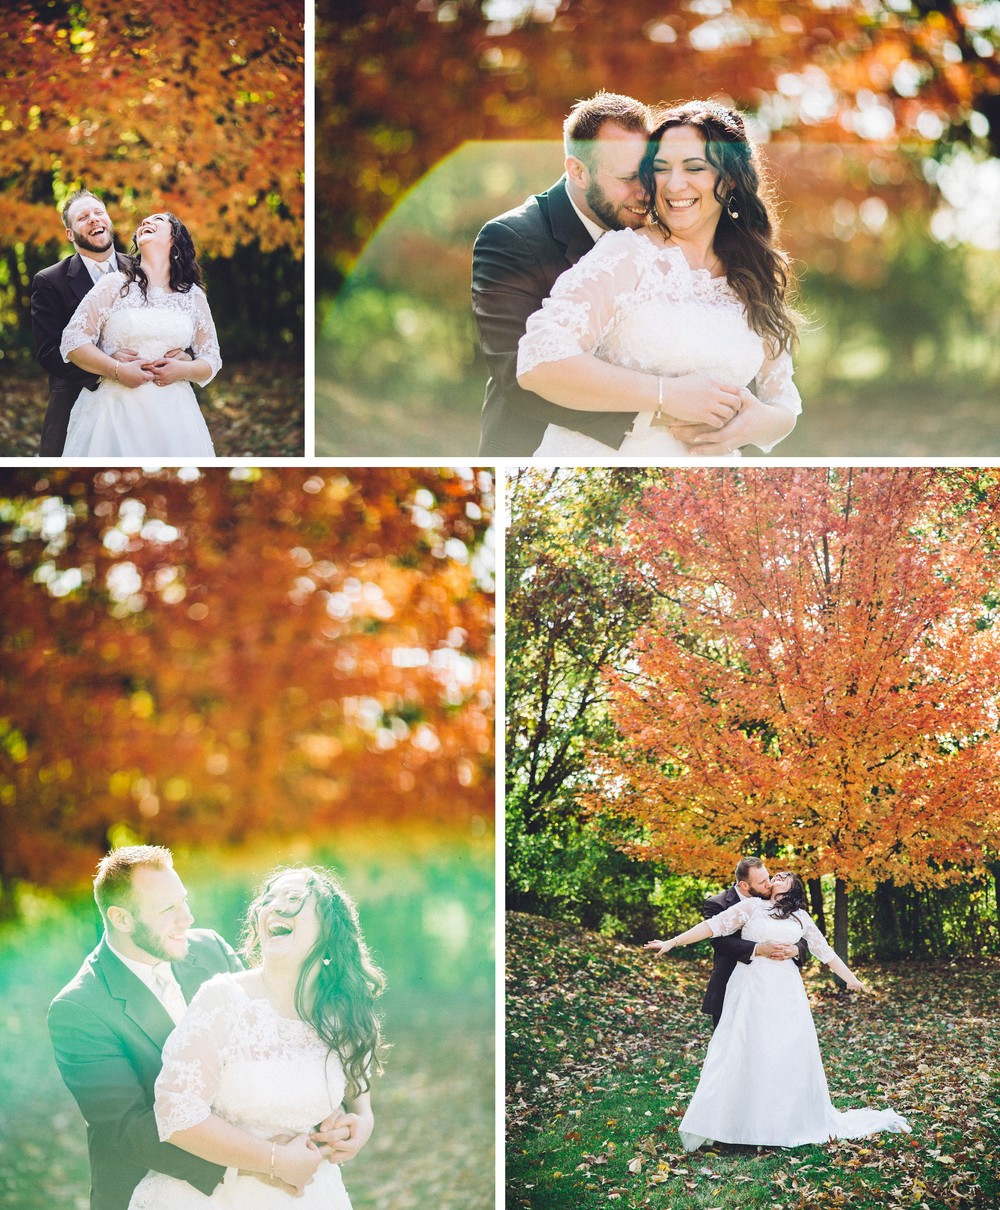 Greek Wedding Photographer in Cleveland 8.jpg